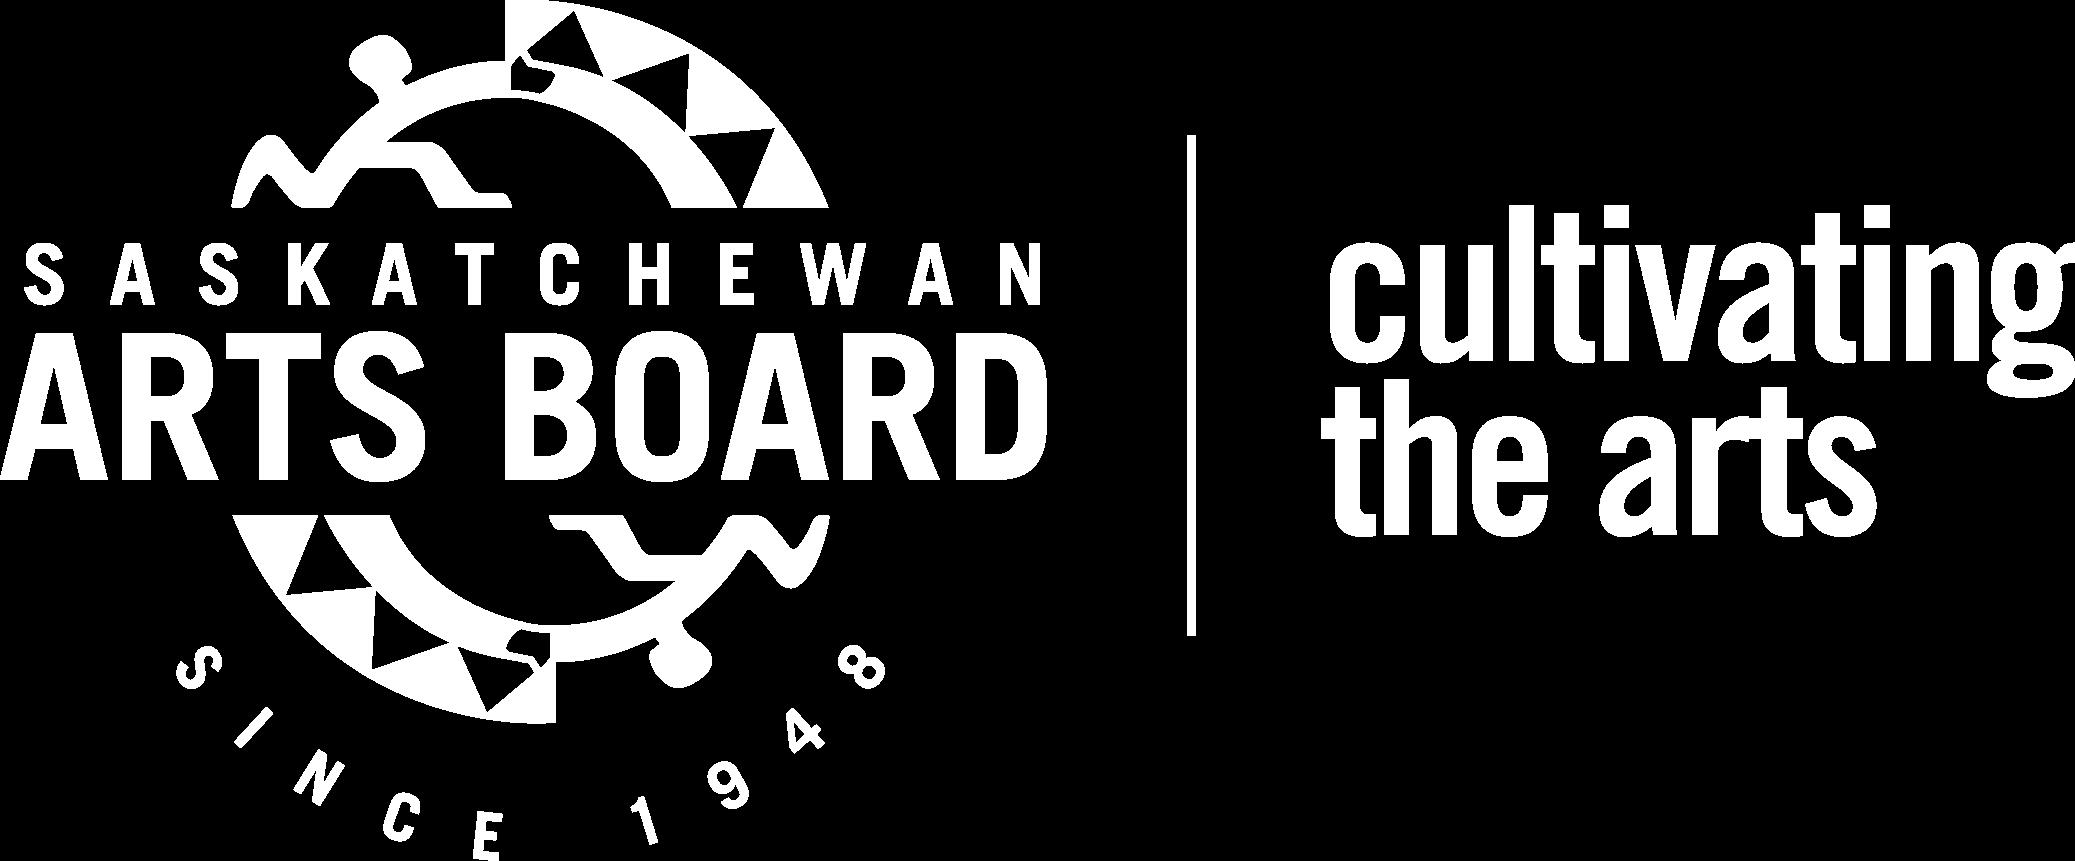 Sask-Art-Board-logo-new-tagline---reverse.png